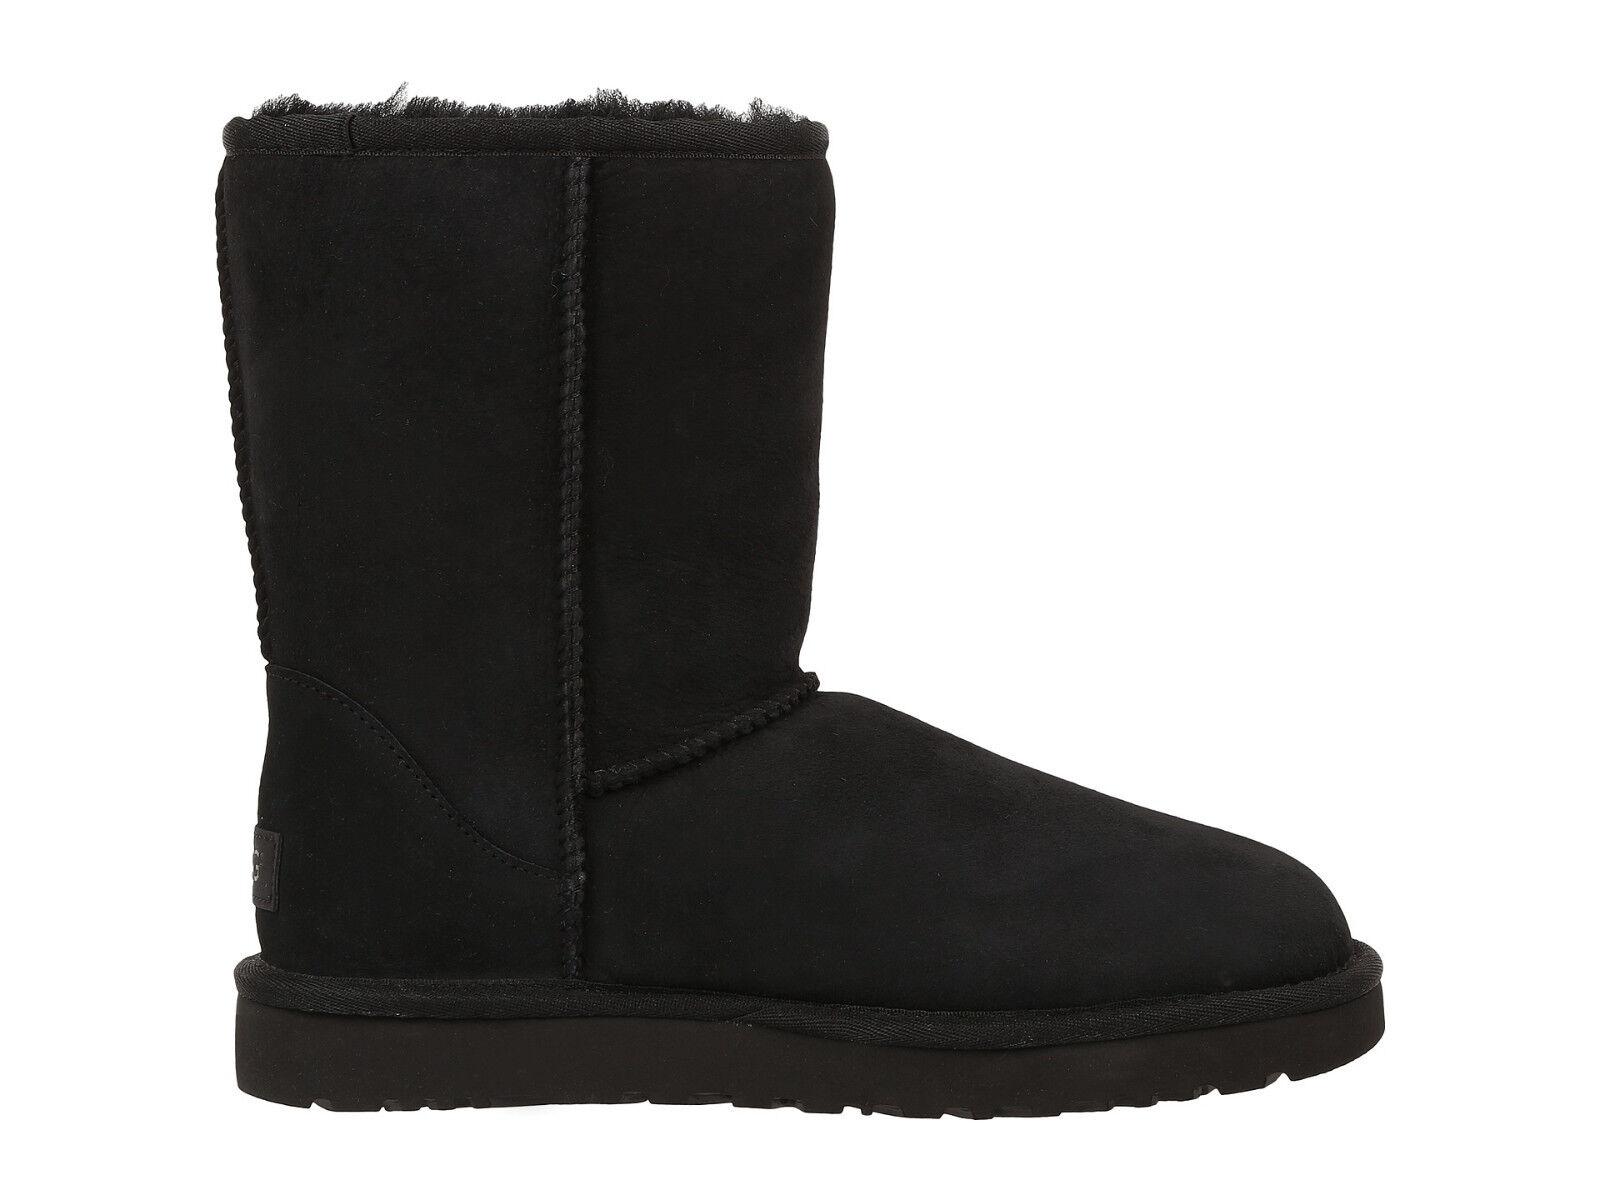 Women UGG Australia Classic Short II Boot 1016223 Black Twinface 100% Authentic